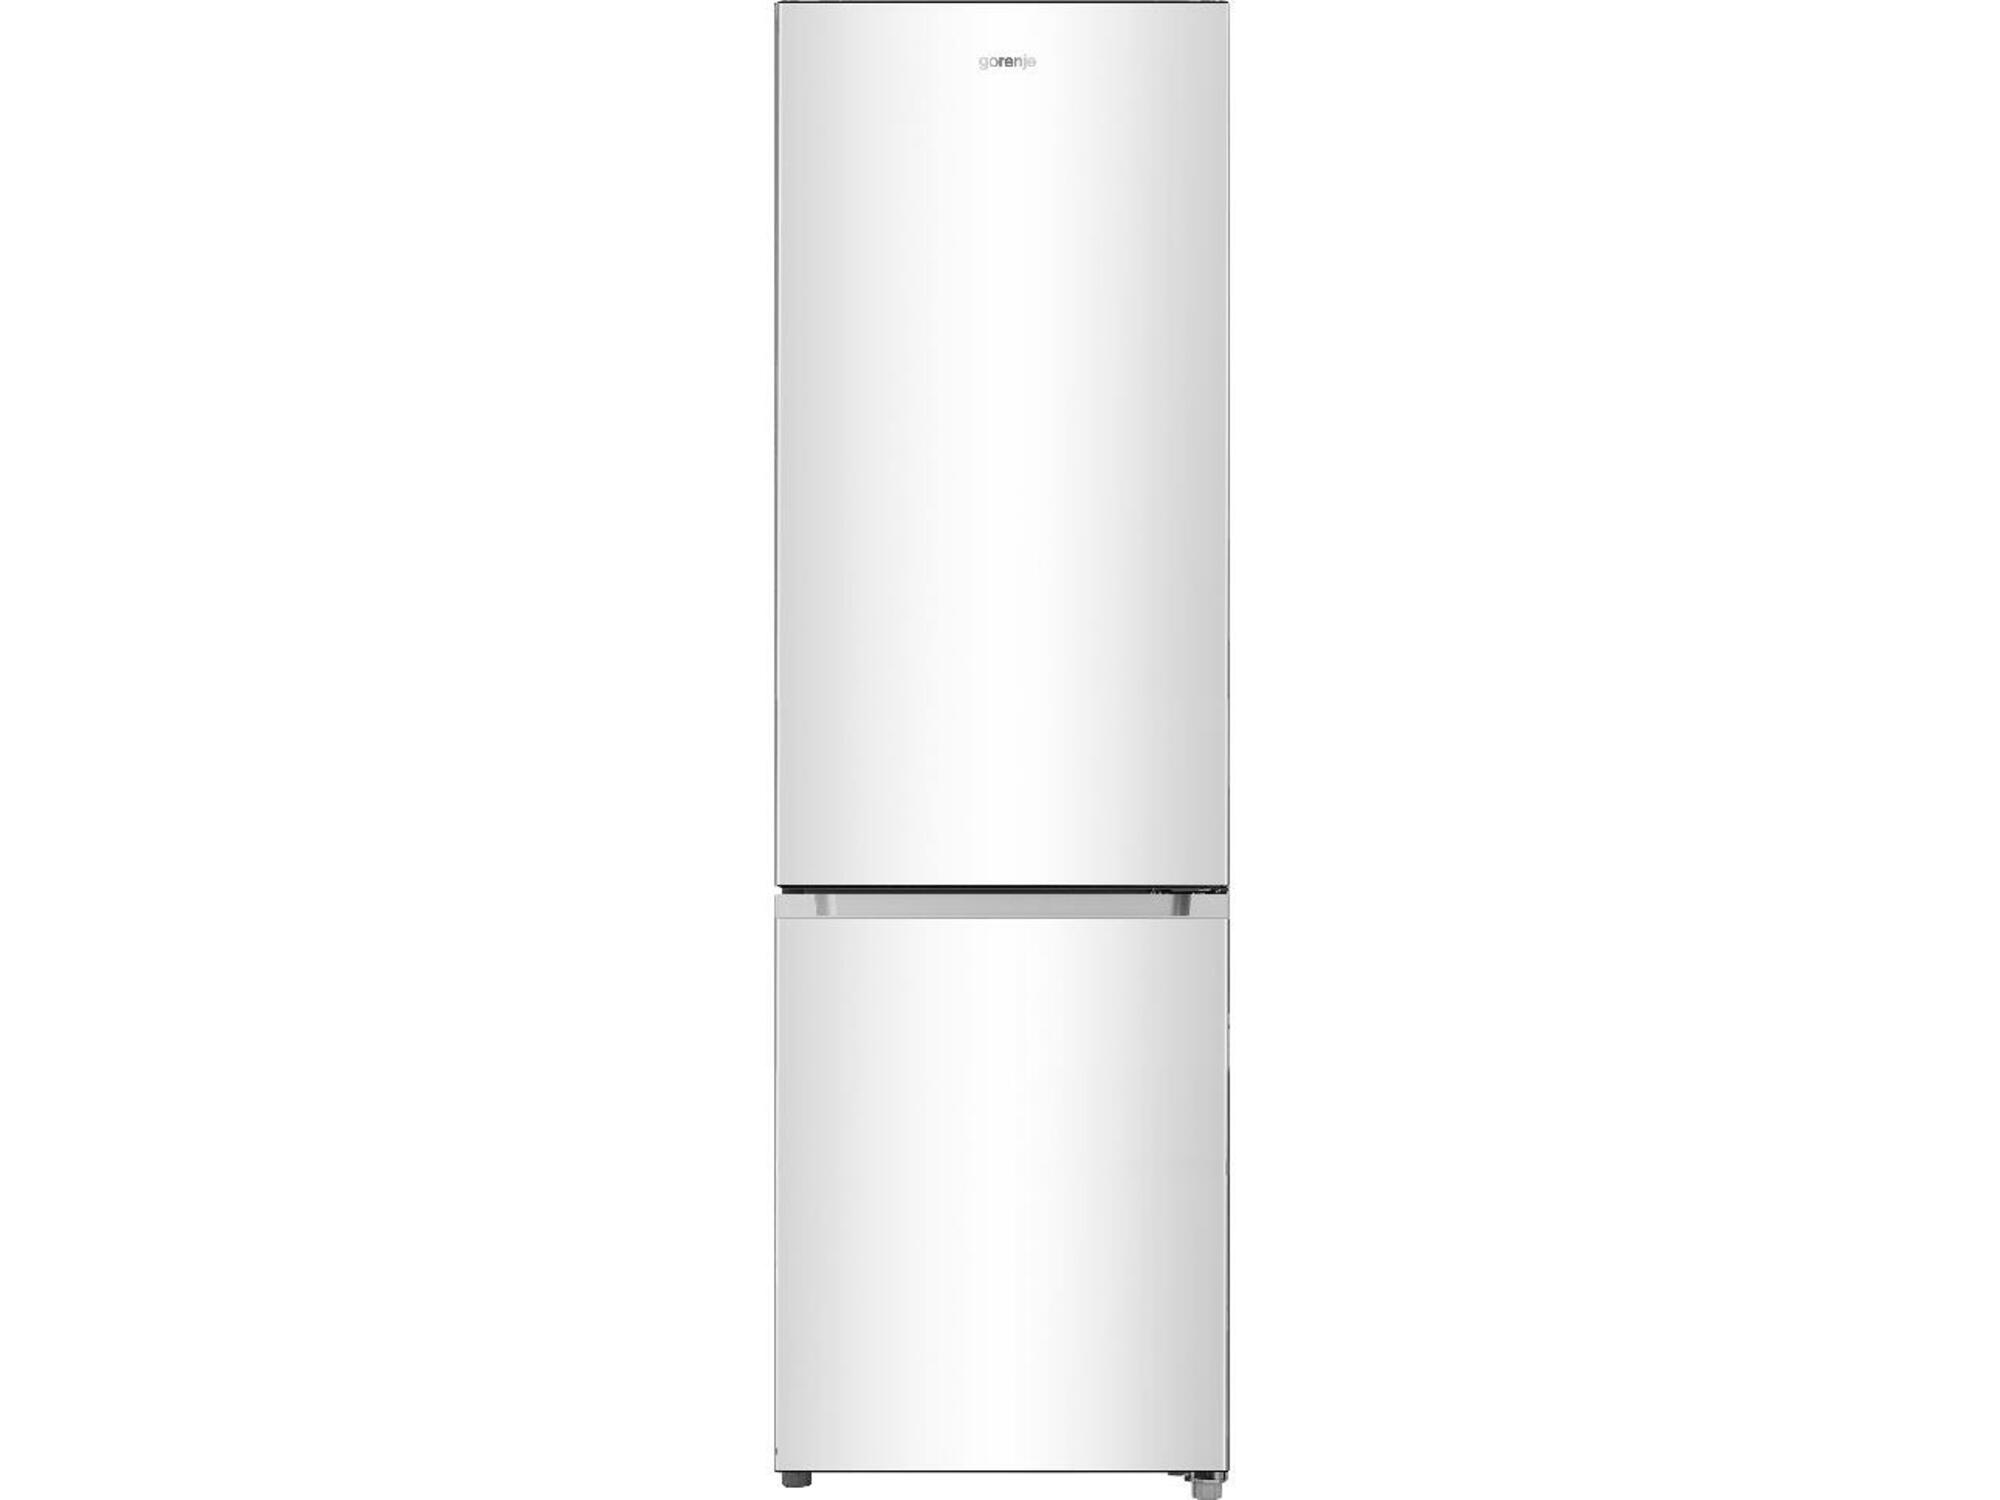 Gorenje Kombinovani frižider RK 4181 PW4